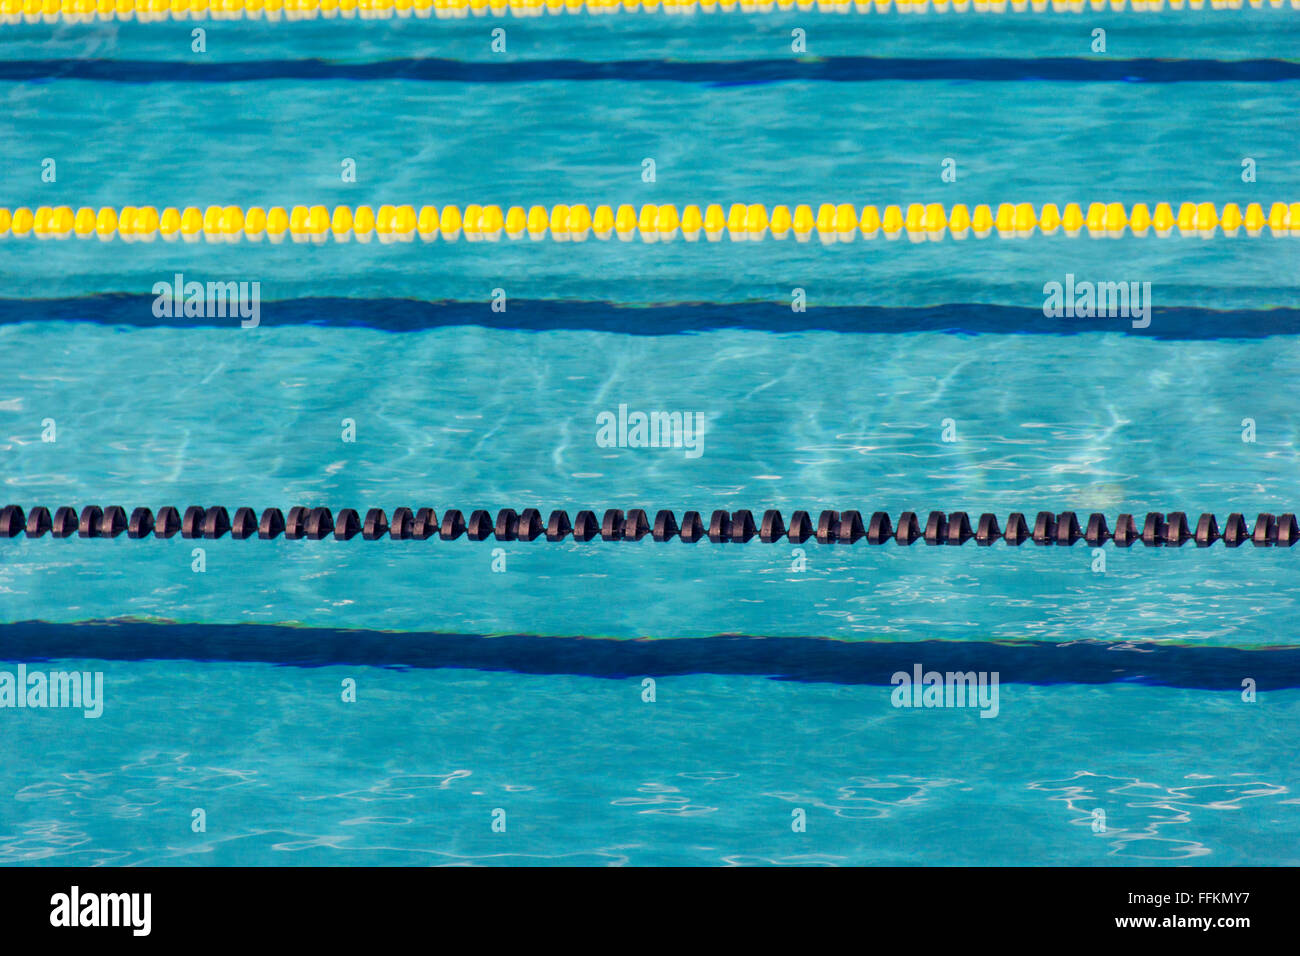 pool, swimming pool, piscina, piscine, tank, rope, string ...